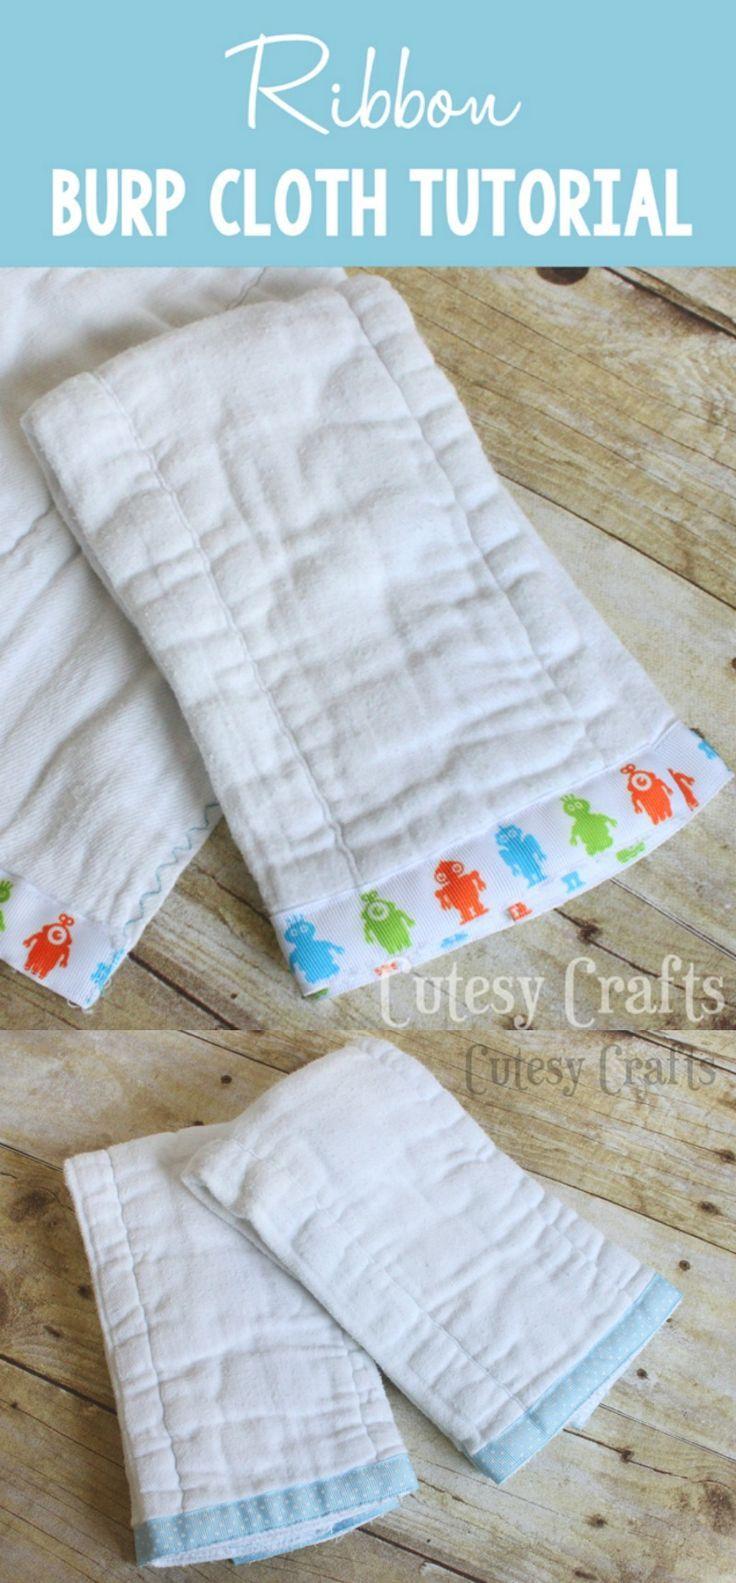 How To Make Baby Burp Cloths An Easy Diy Baby Things Baby Burp